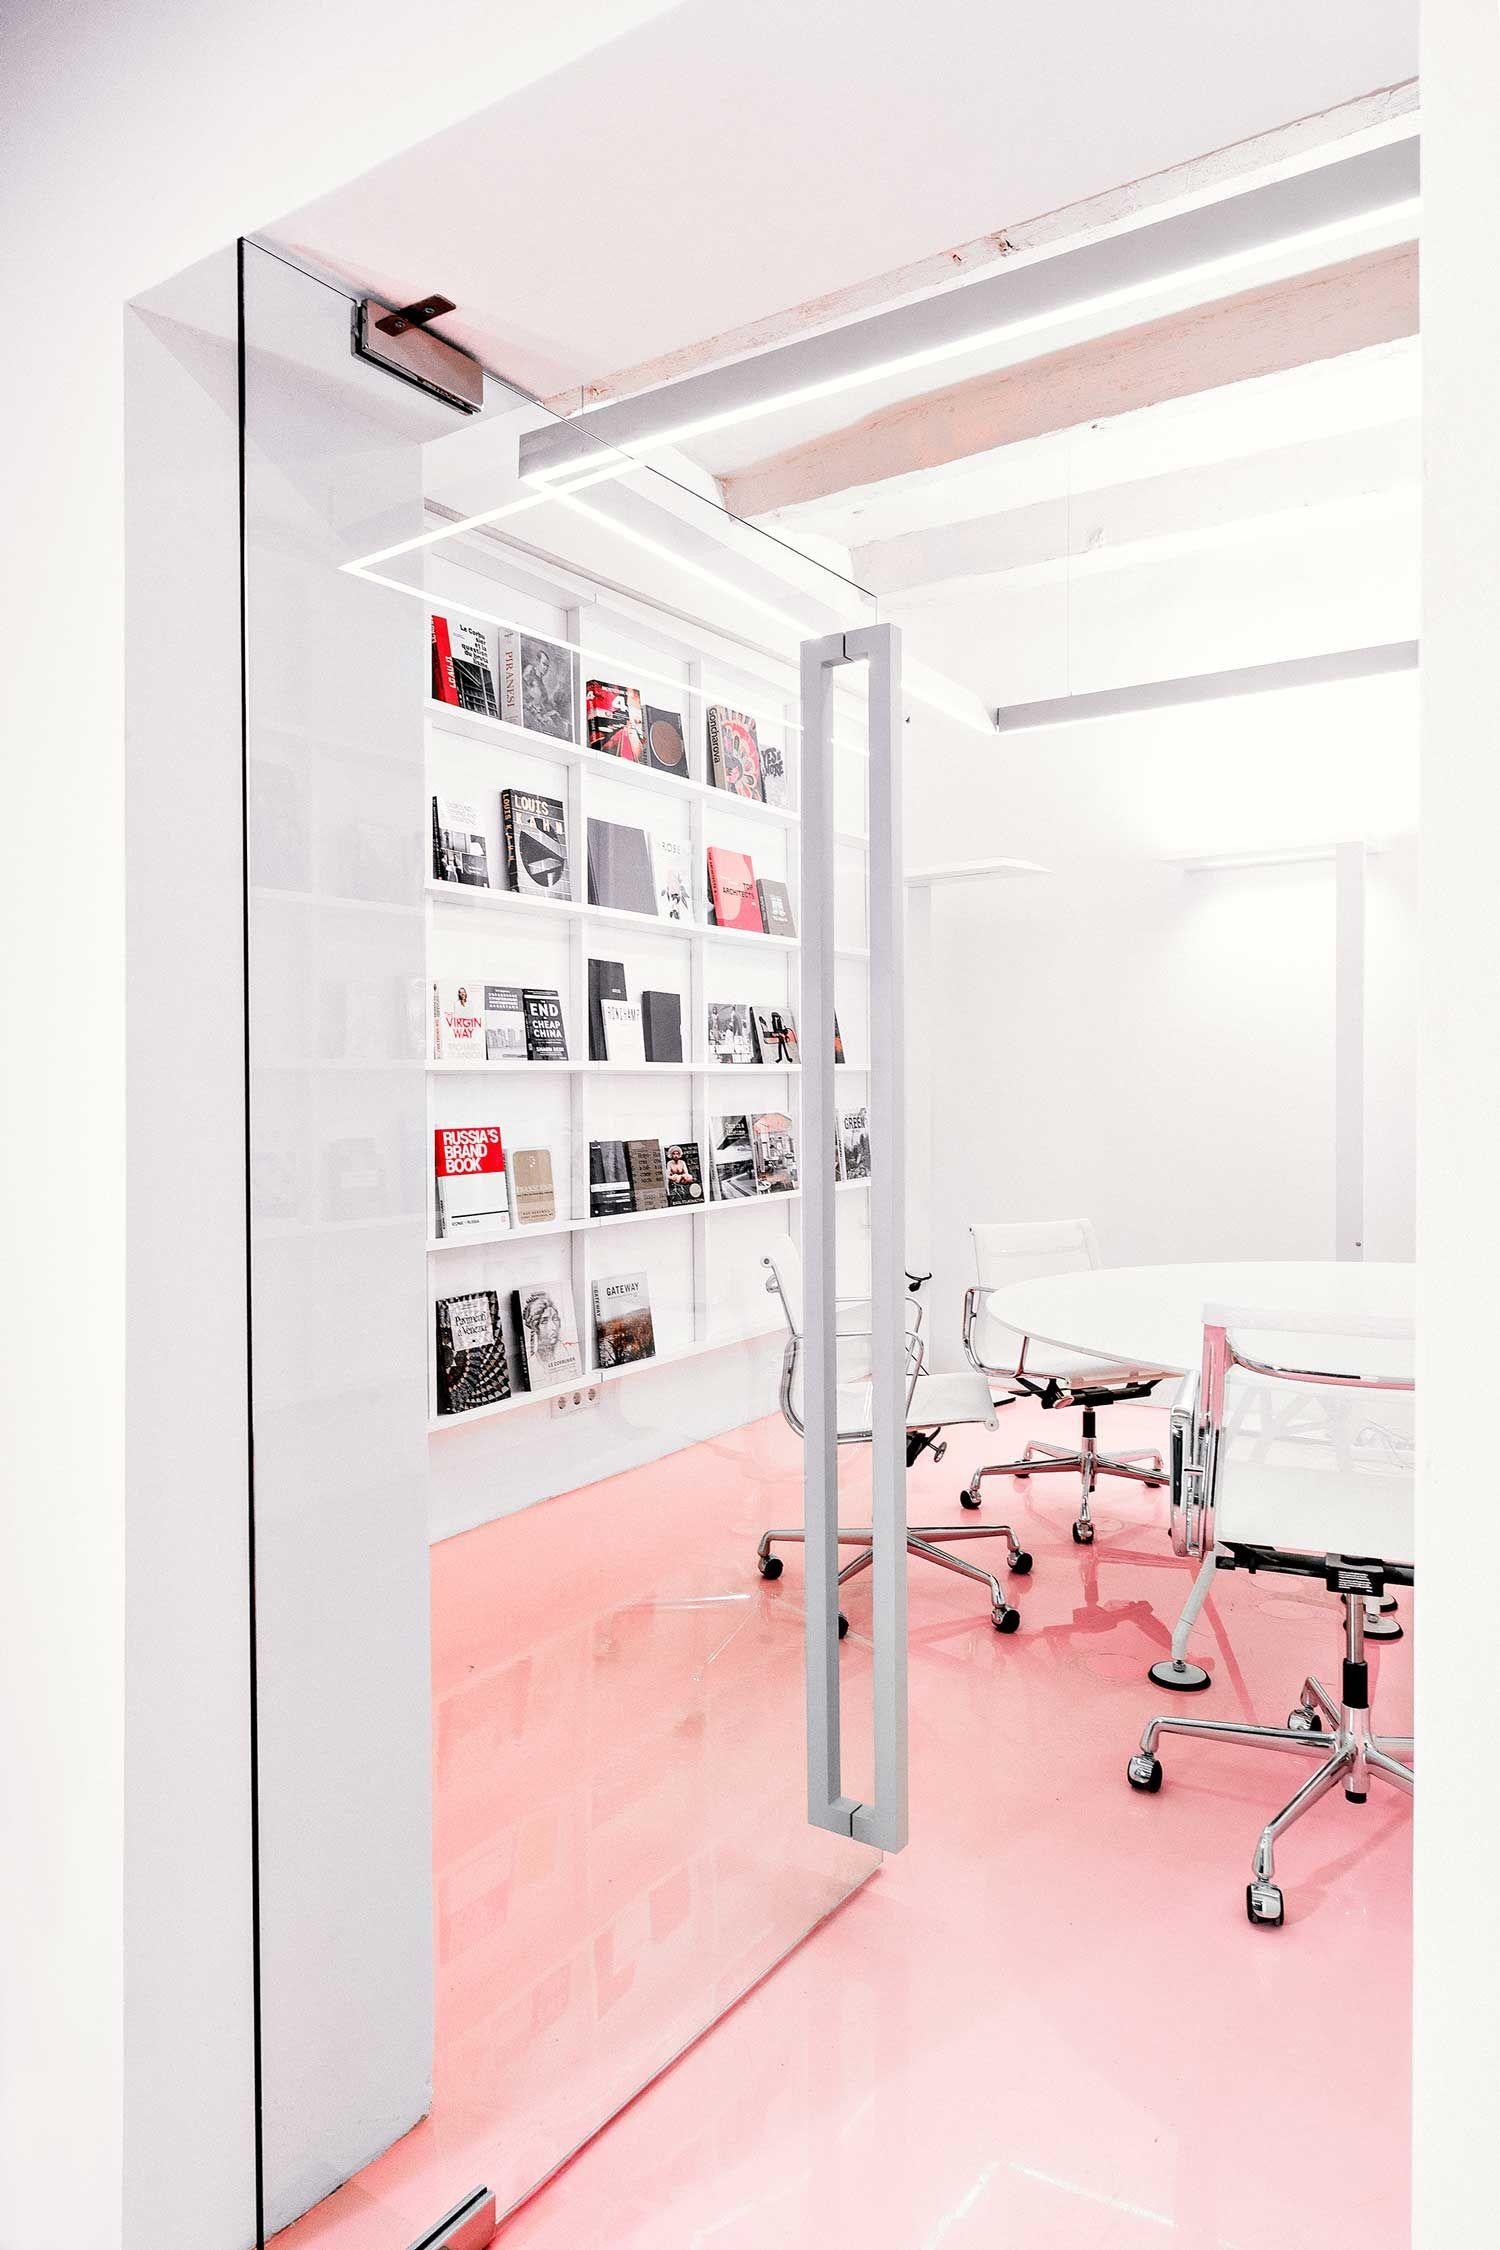 NGRS Recruiting Company HQ by Crosby Studios | Yellowtrace NOMOS - Tecno Aluminium group